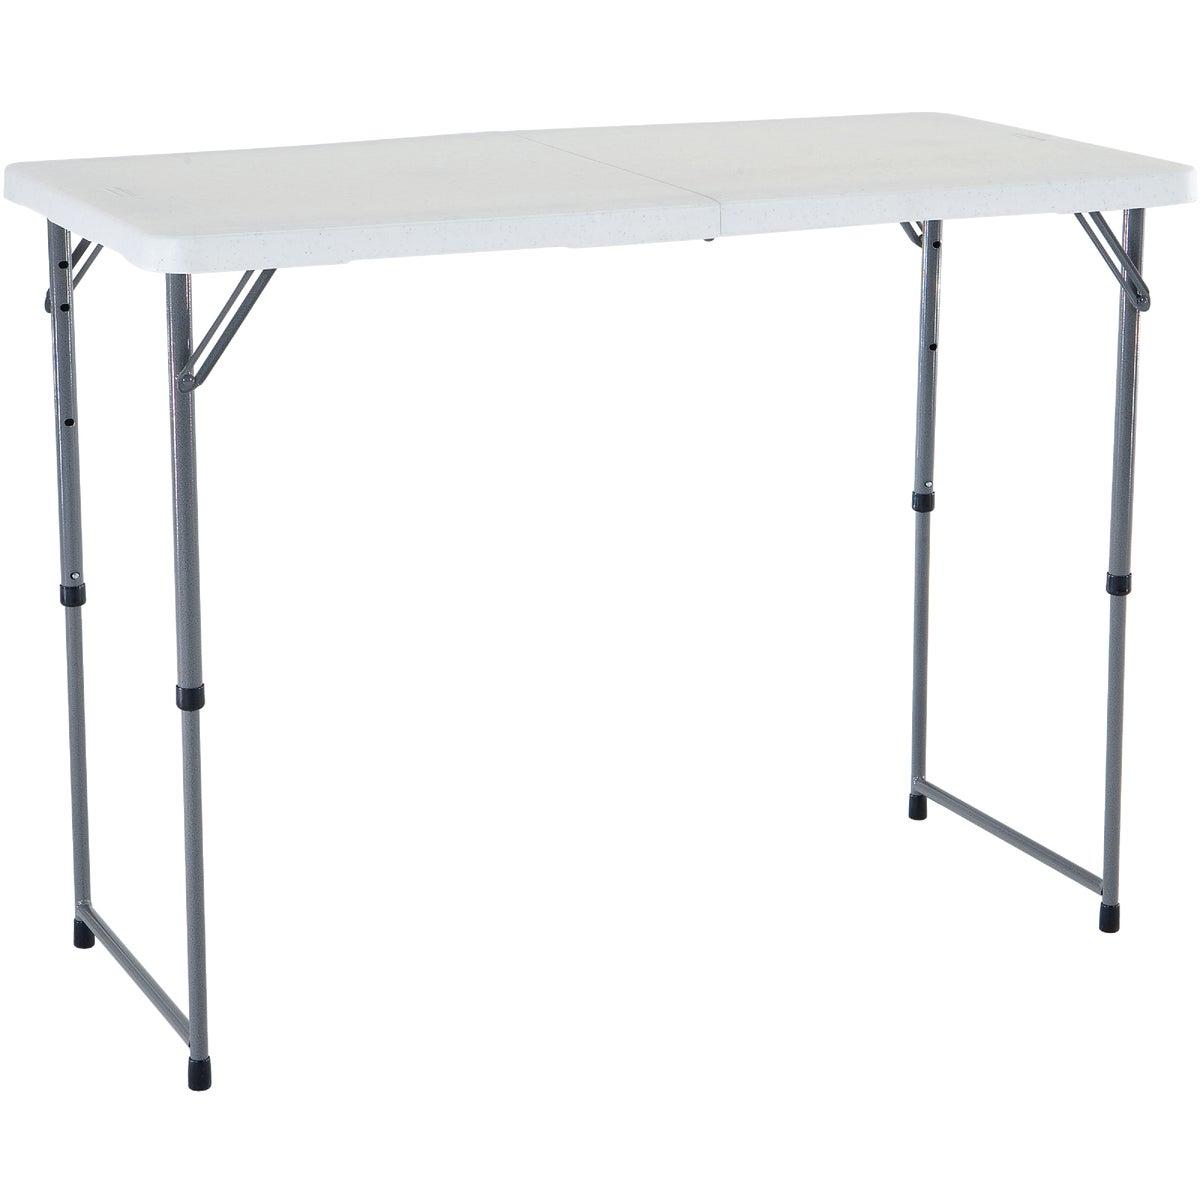 4FT FOLD-IN-HALF TABLE